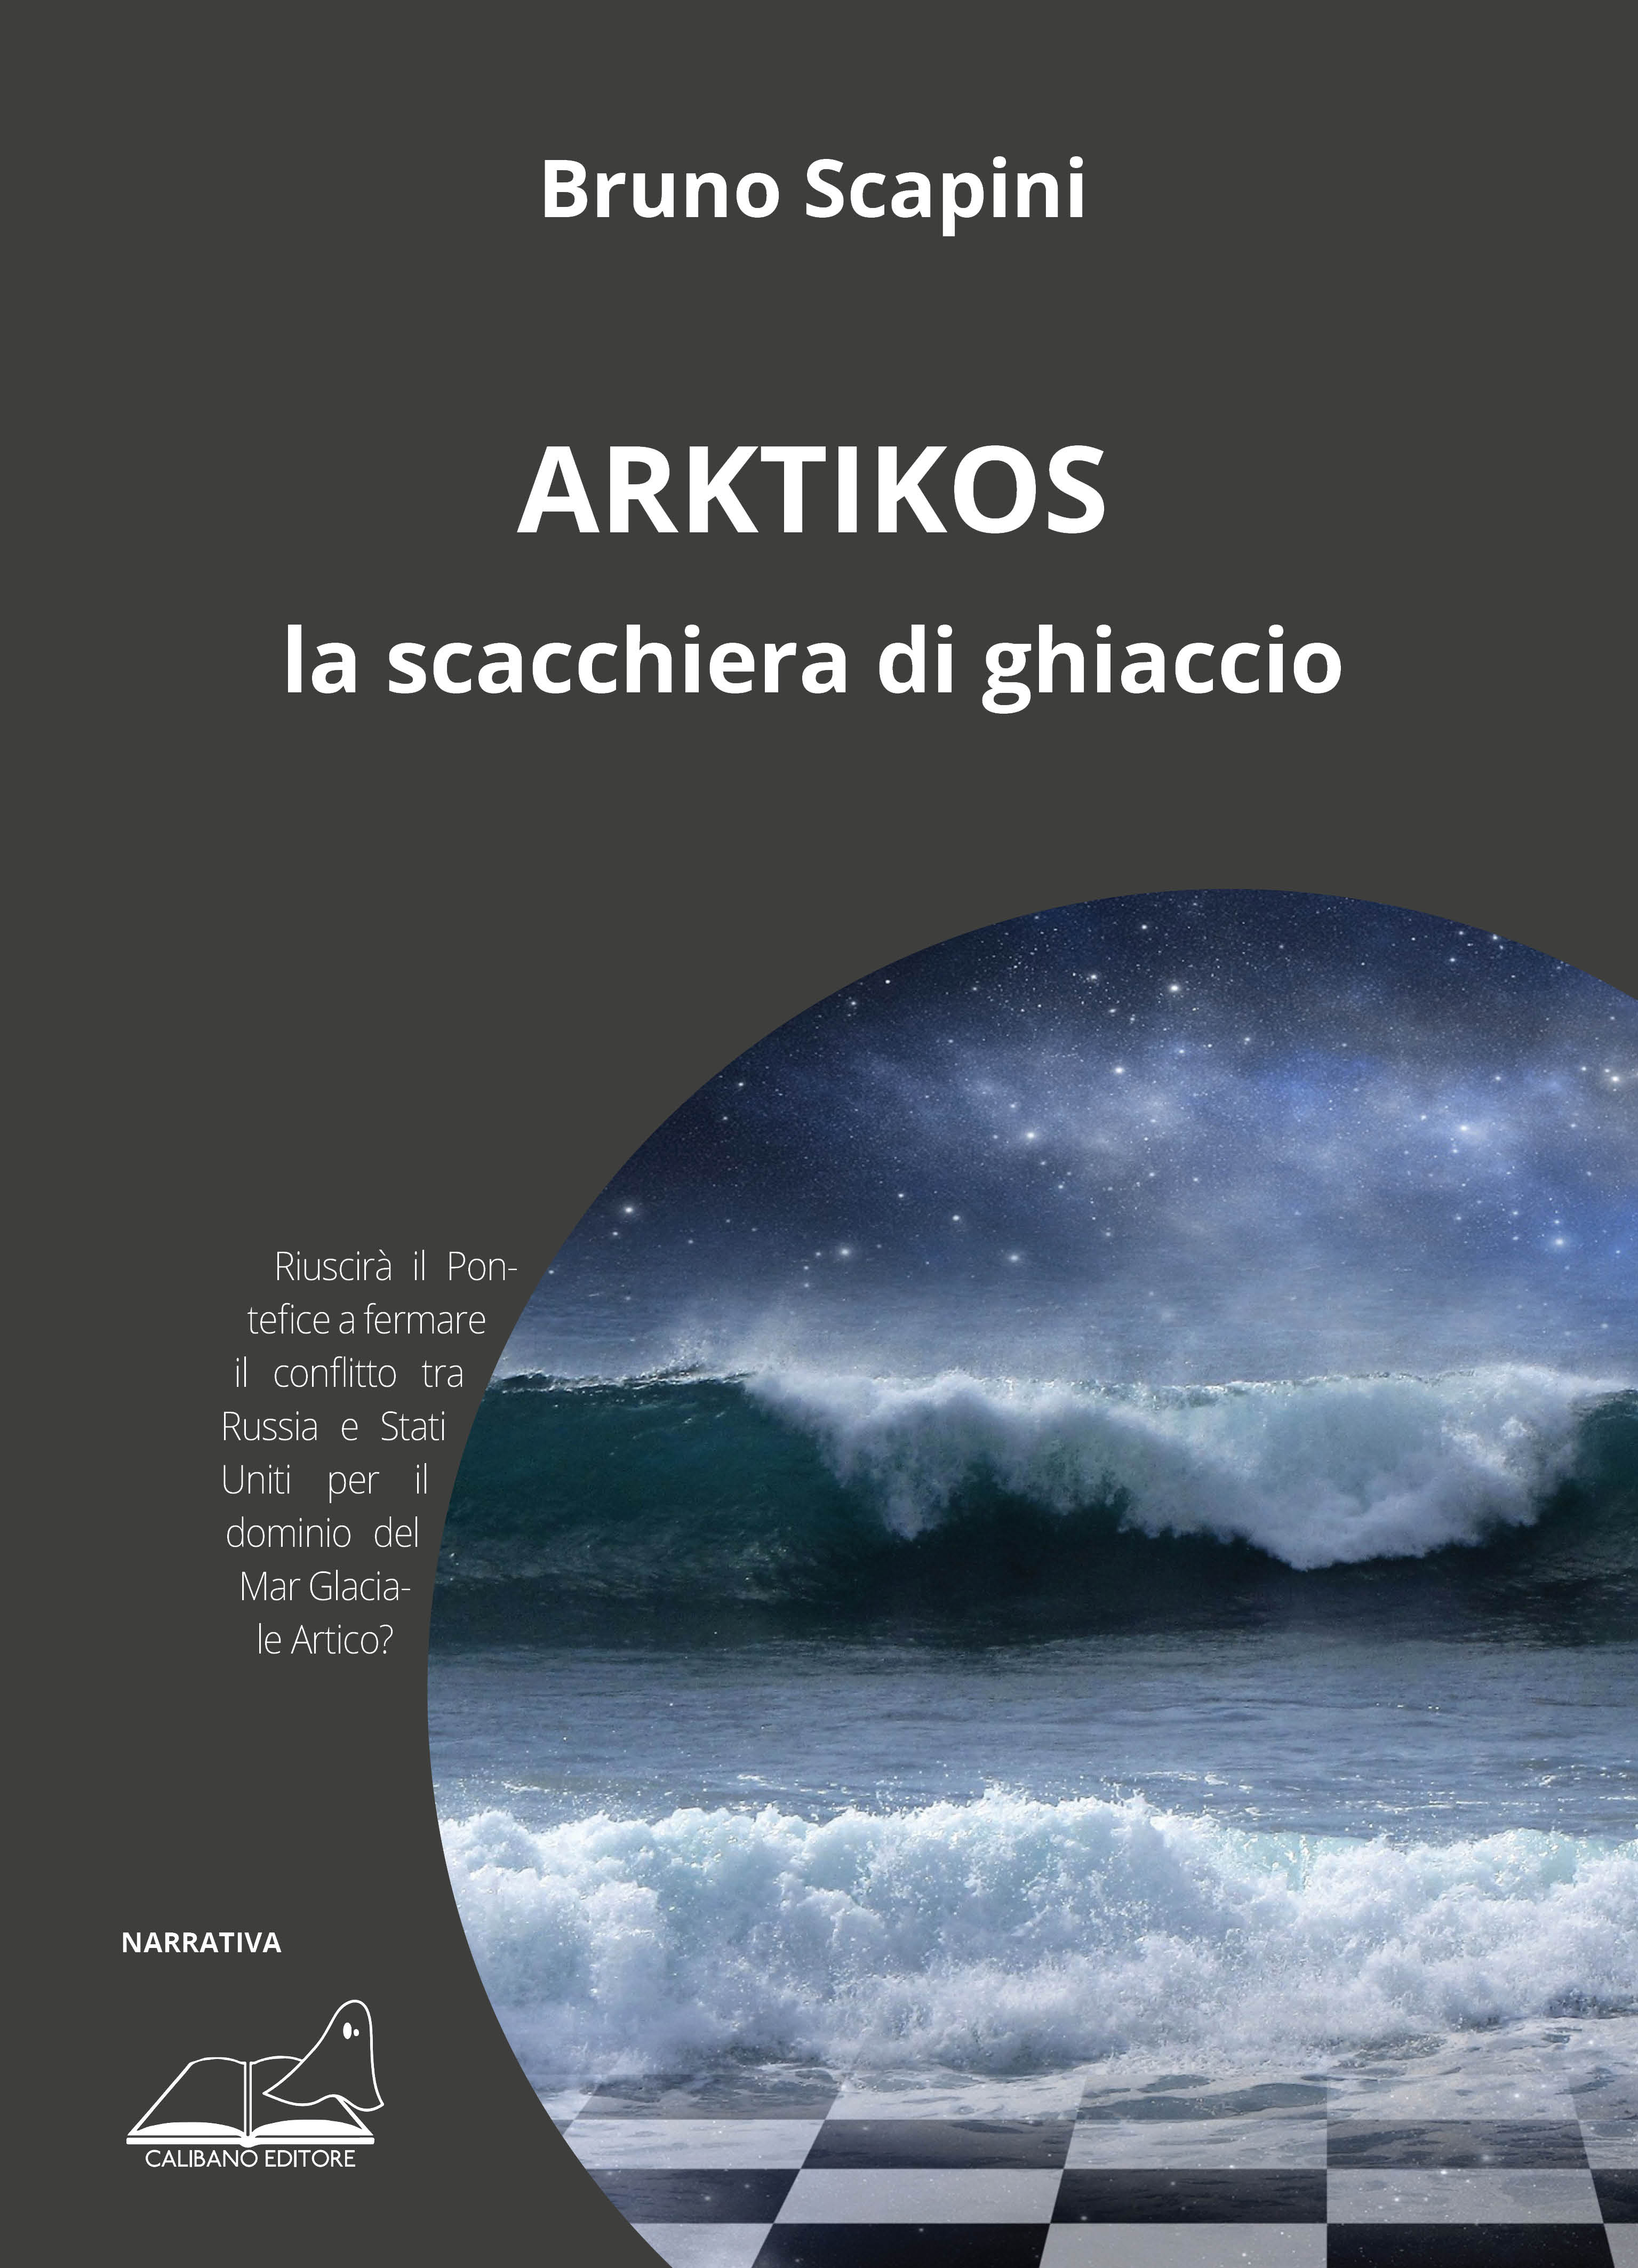 Arktikos-image-1%>